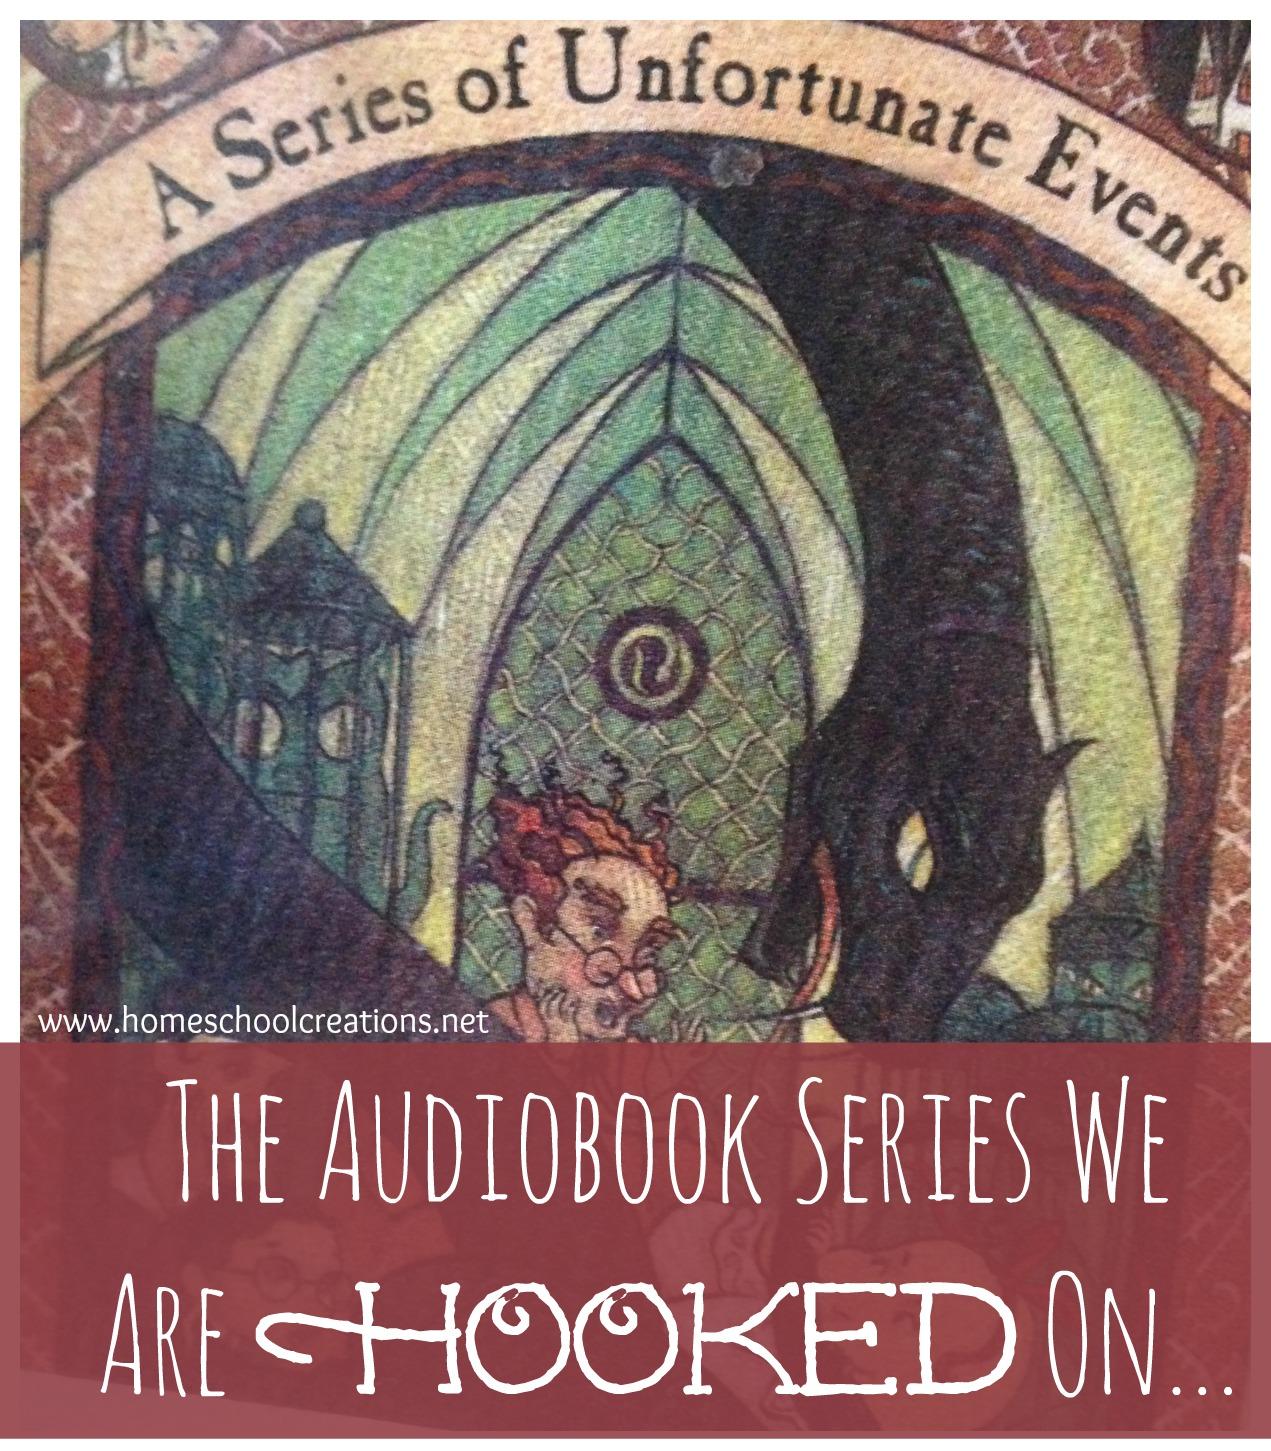 Lemony Snicket audiobook series